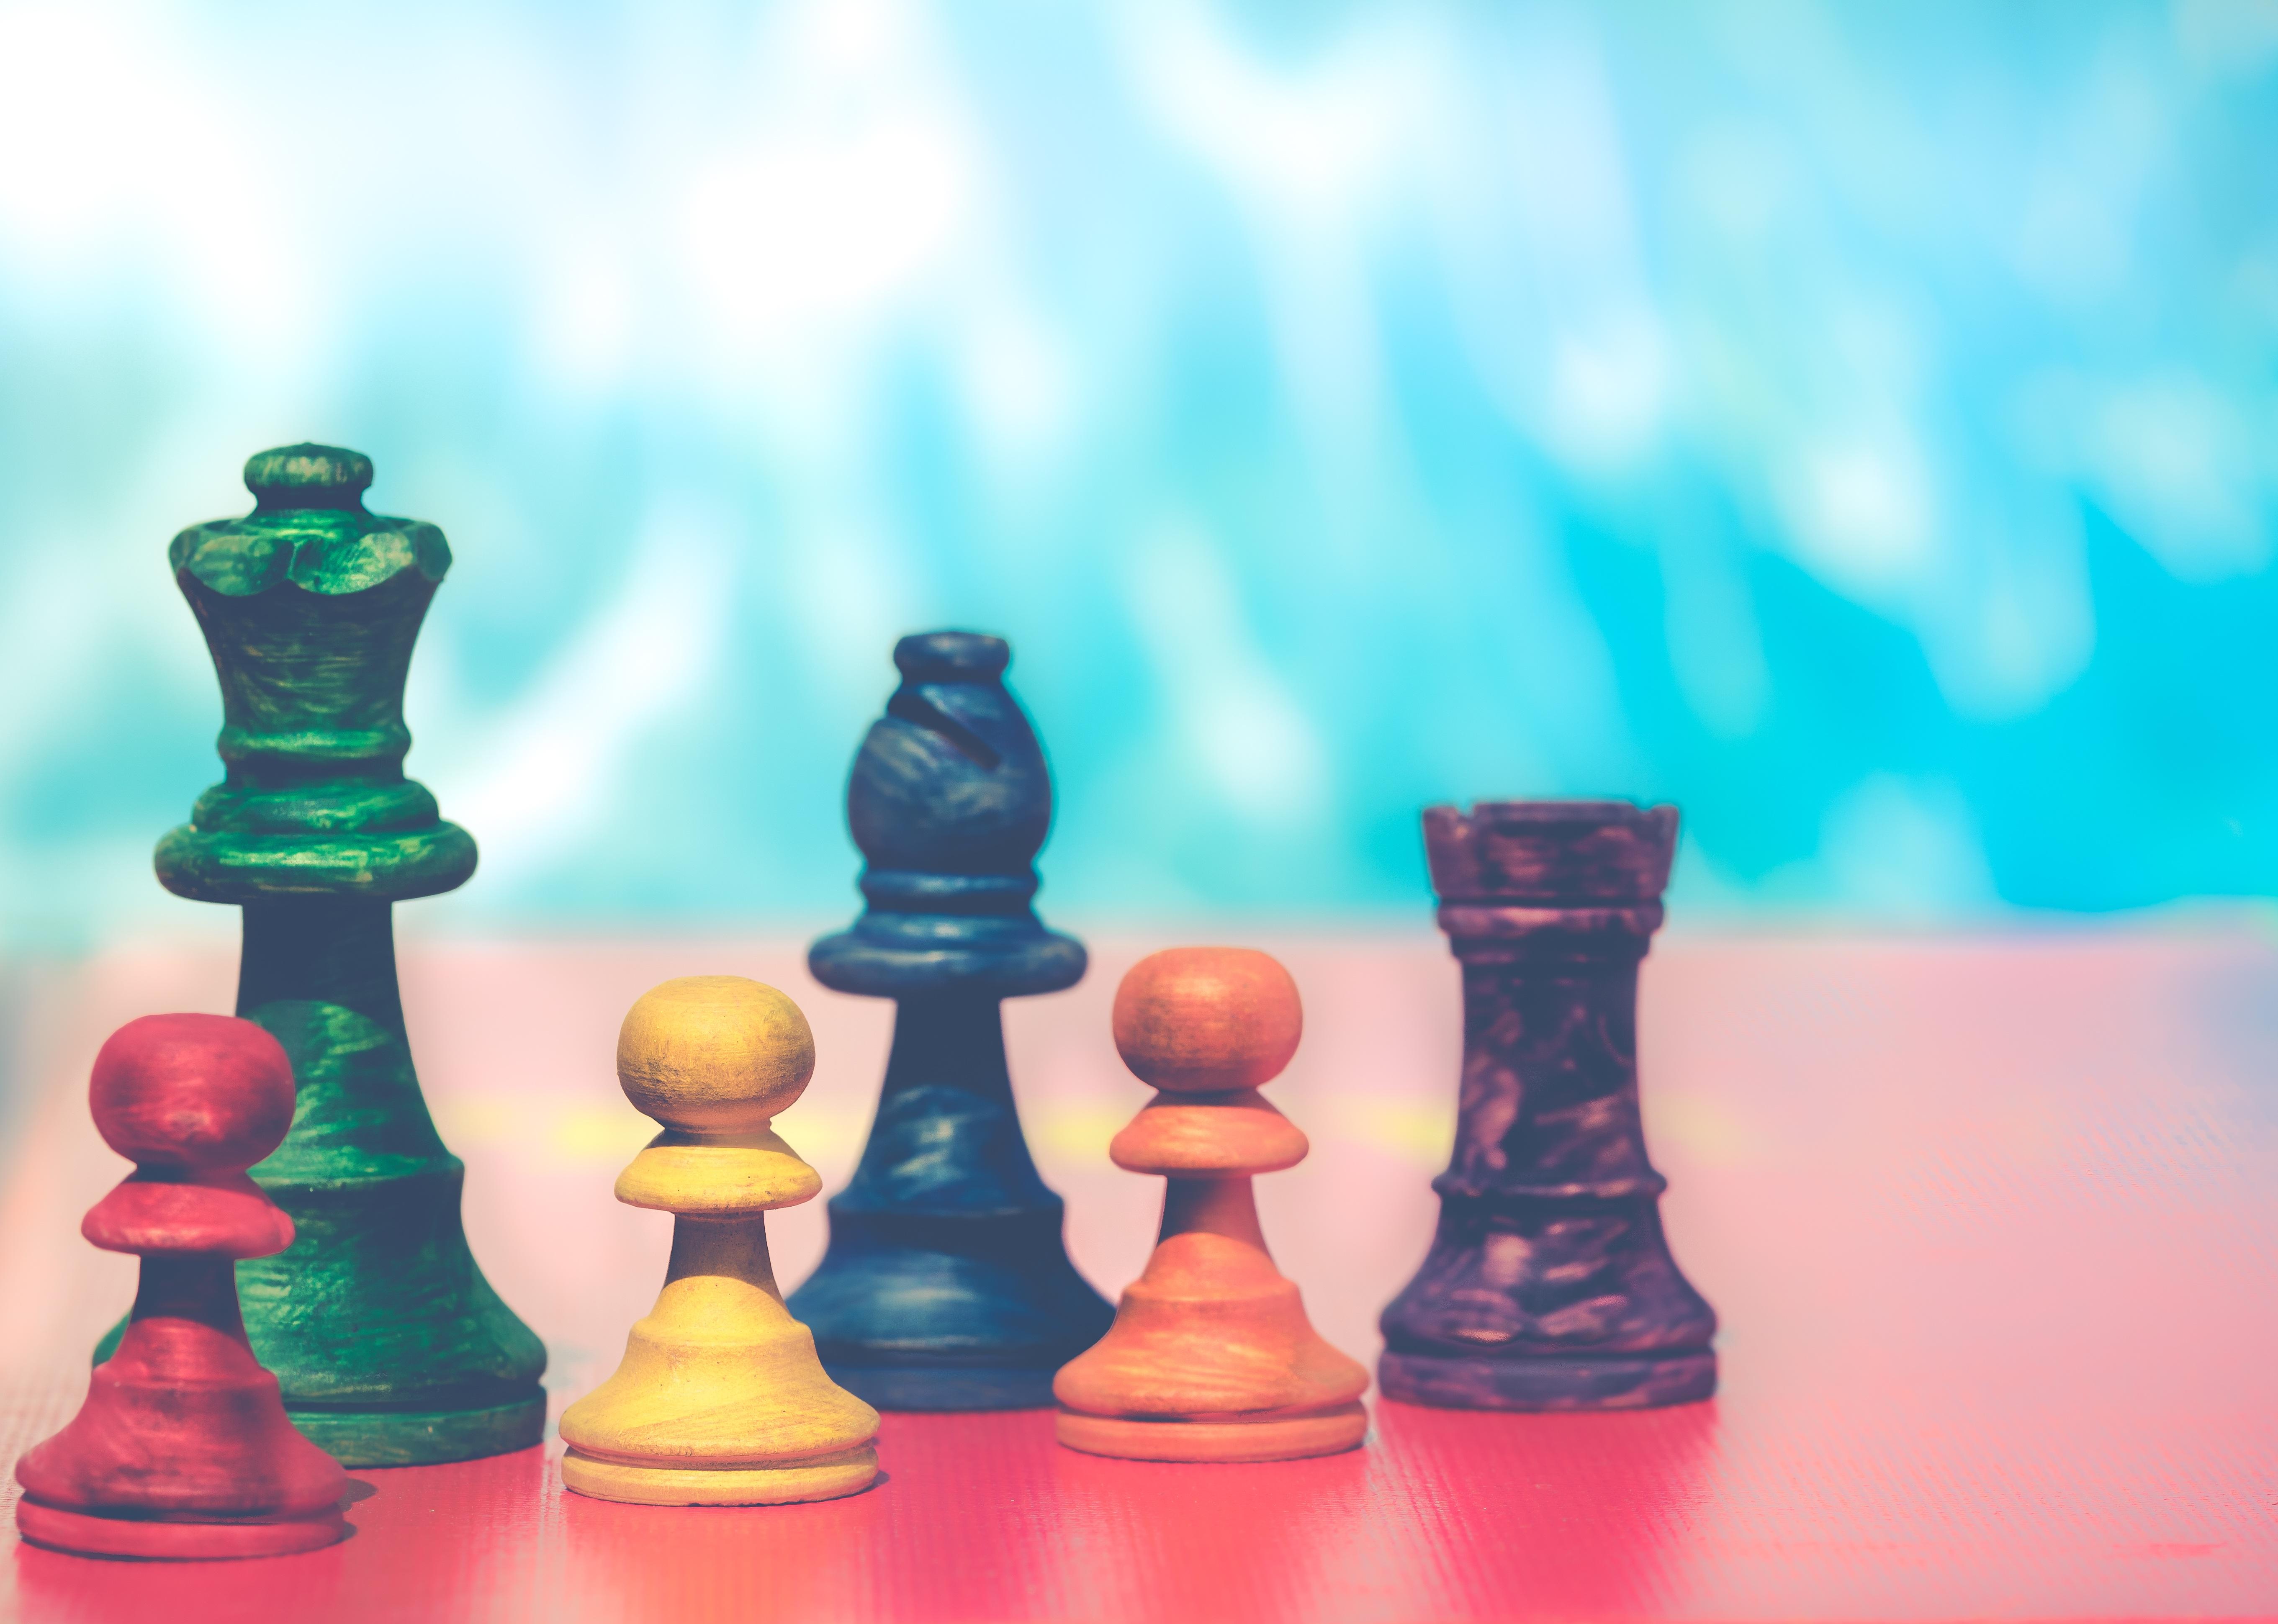 pawns-3467512